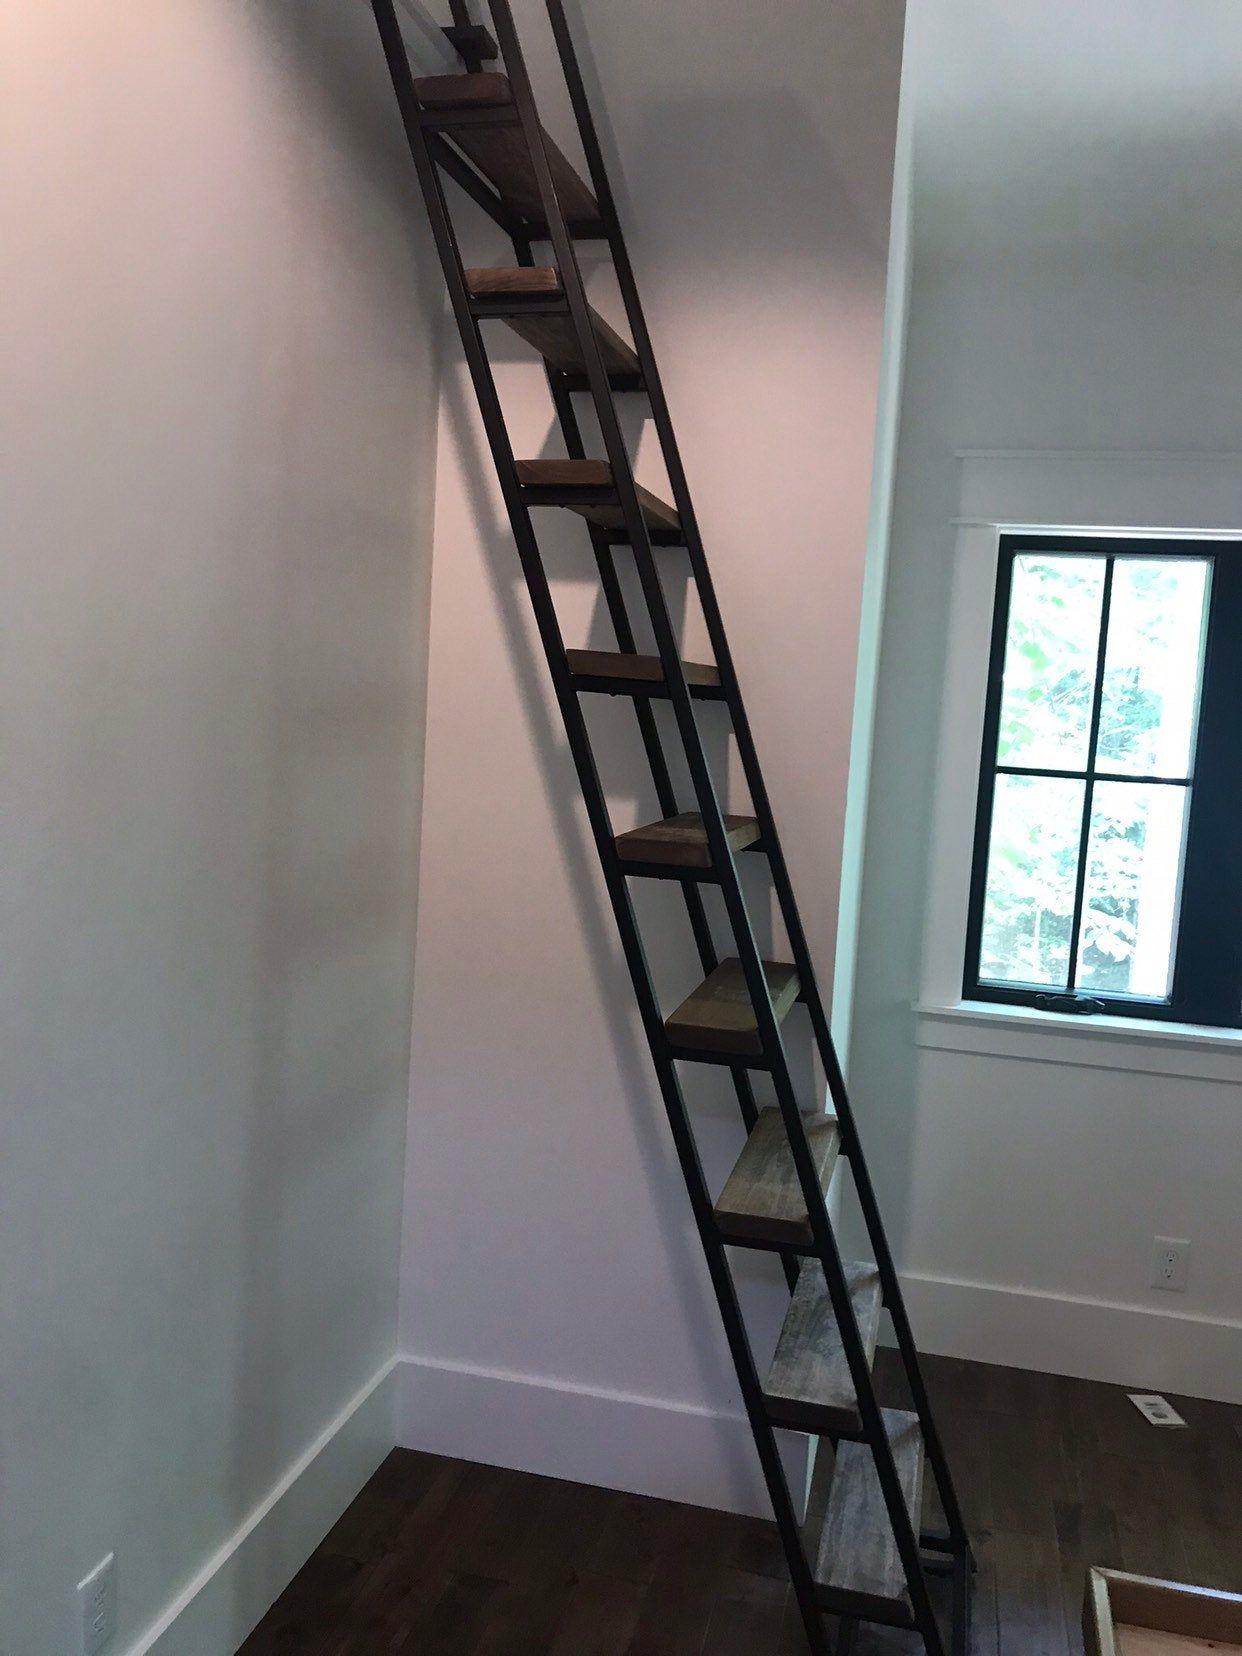 10ft Loft Ladder Librarian Free Shipping To Your Door Etsy Loft Ladder Tiny Loft Loft